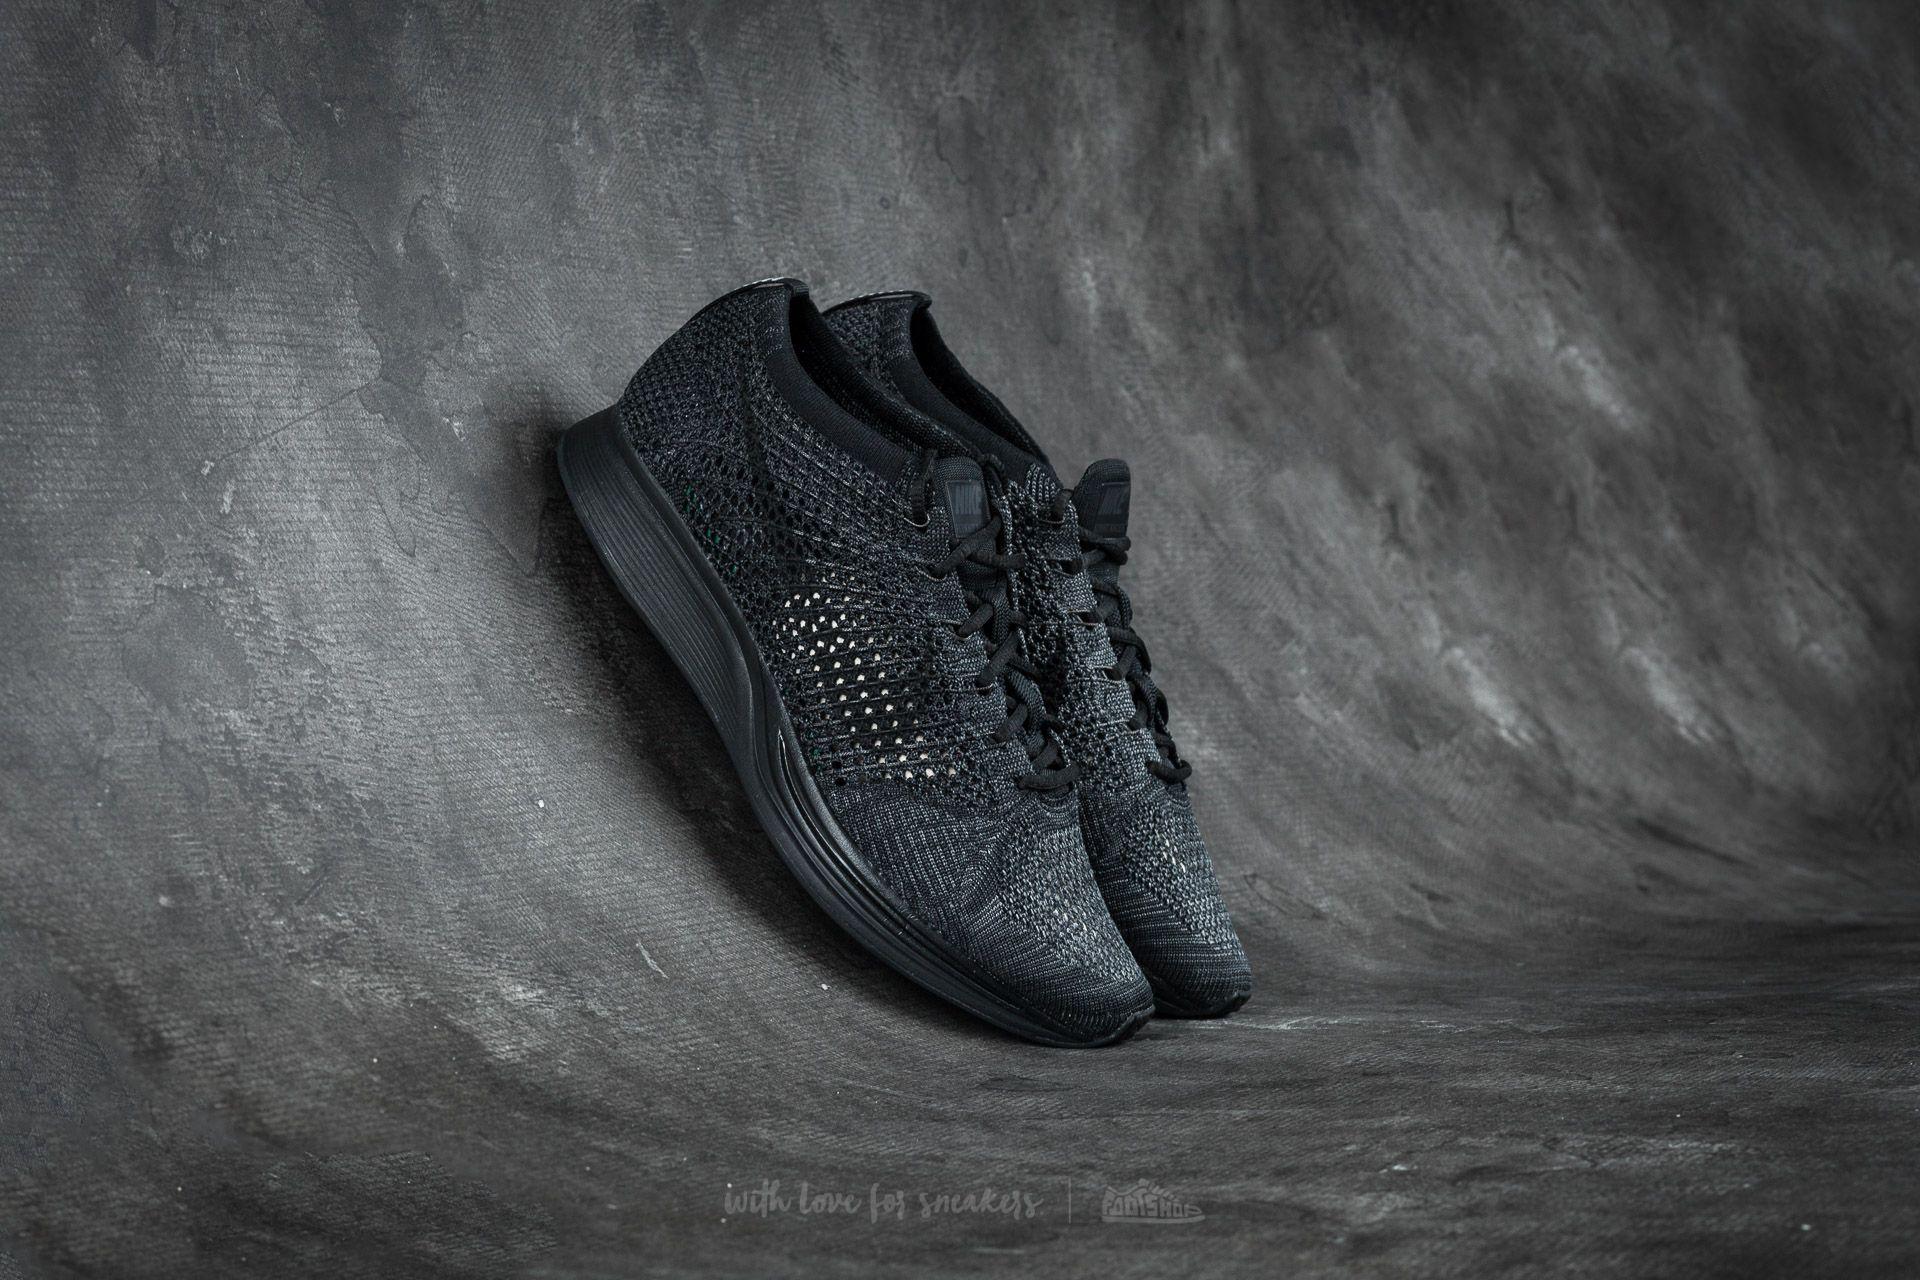 f104f92ec90cd Nike Flyknit Racer Black  Black-Anthracite